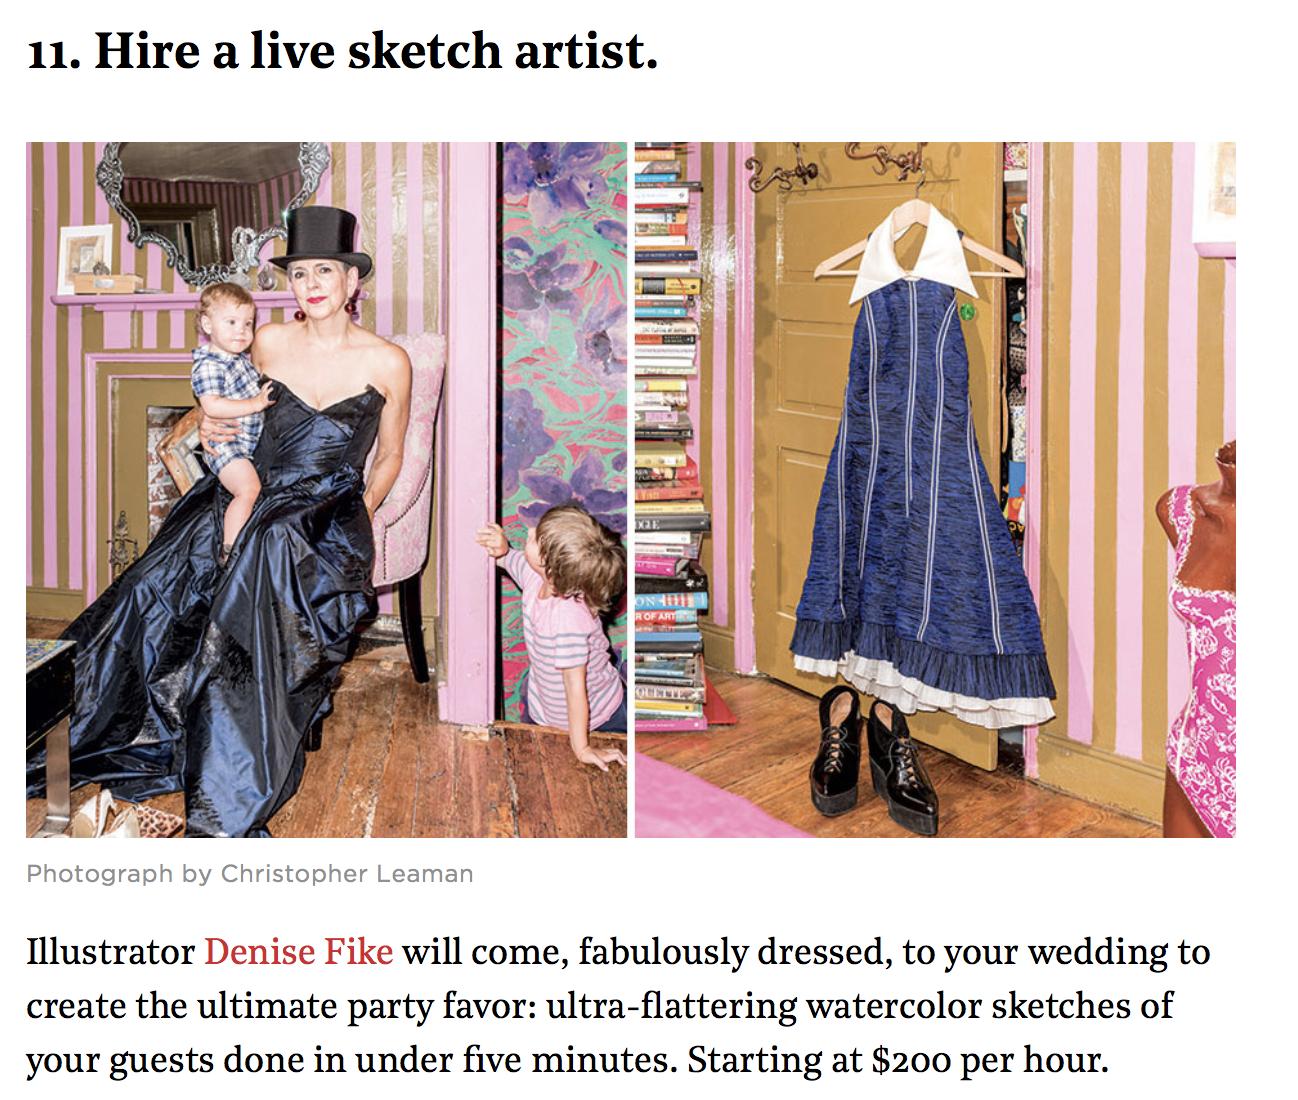 Hire a live sketch artist Denise Fike